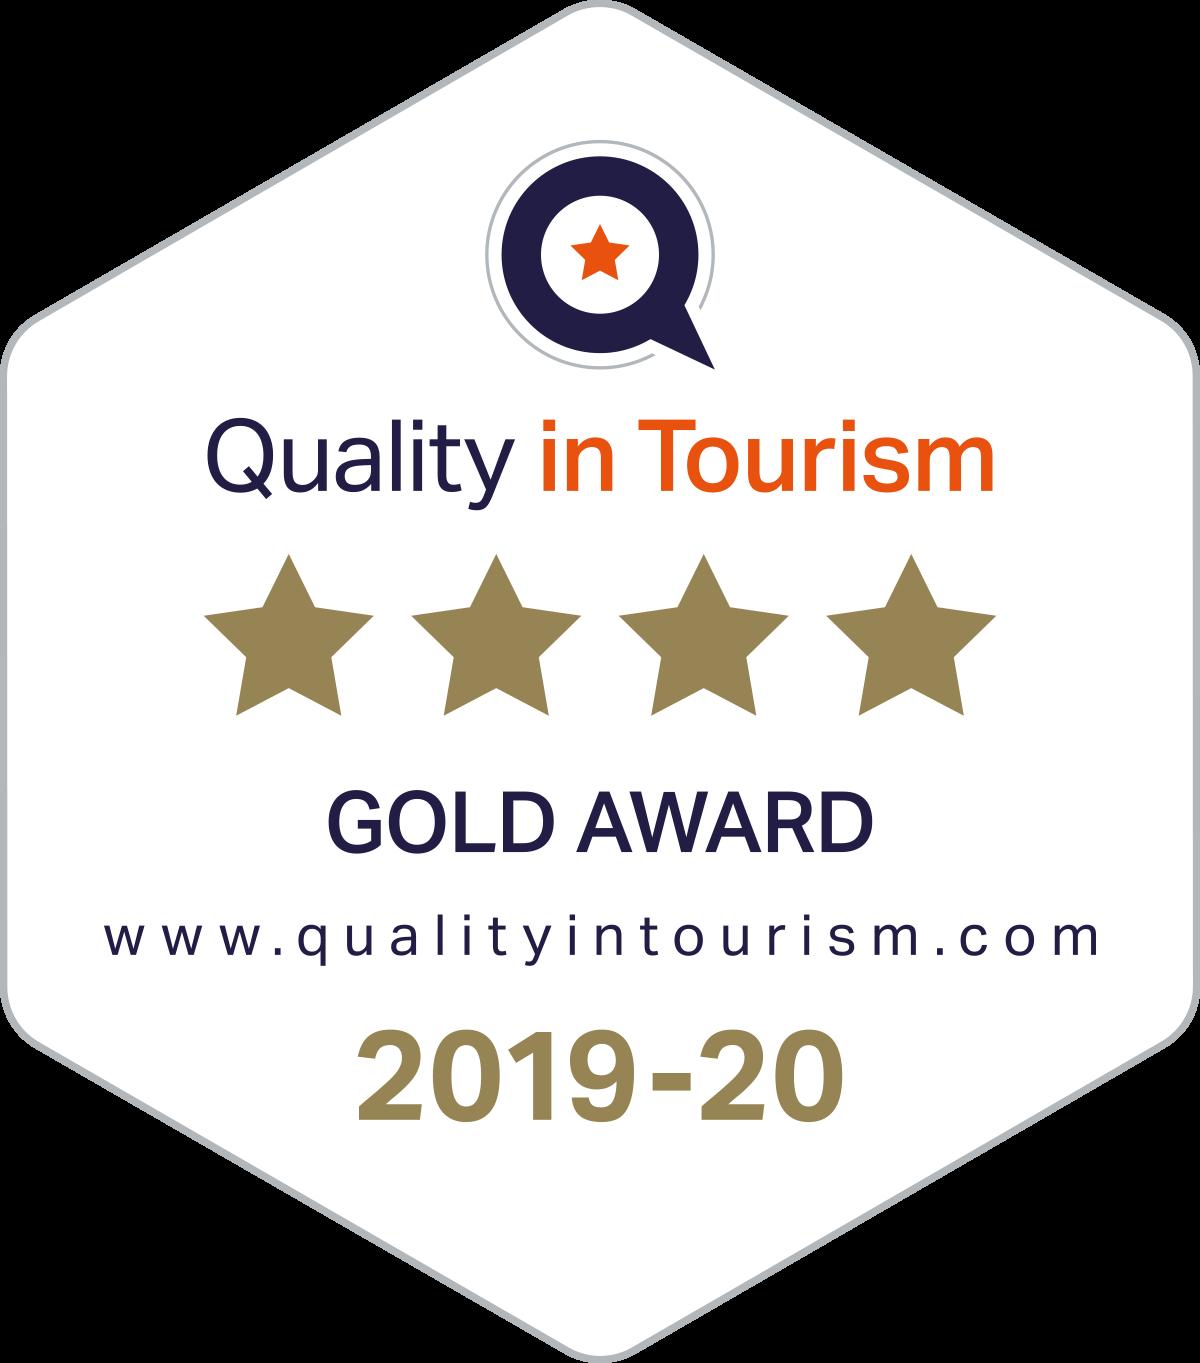 qt-marque-4-star-gold-2019-20-rgb